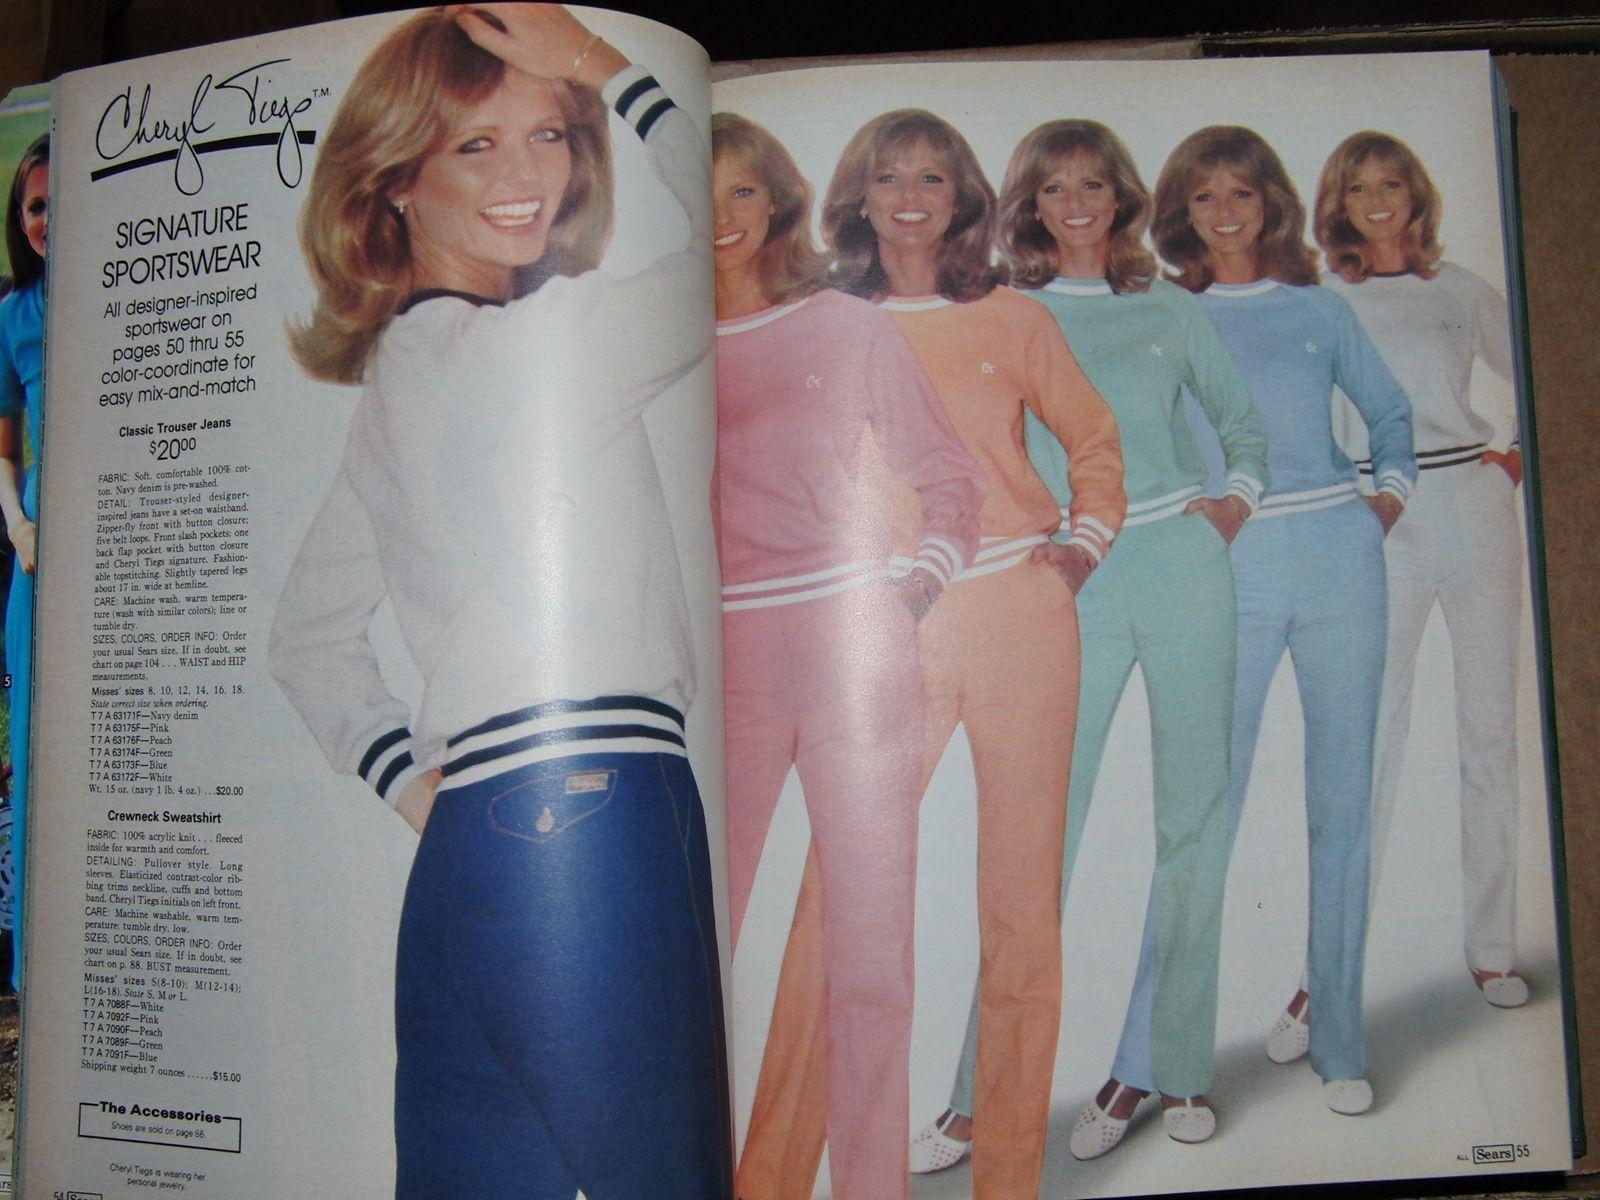 1986 Cheryl Tiegs Sportswear